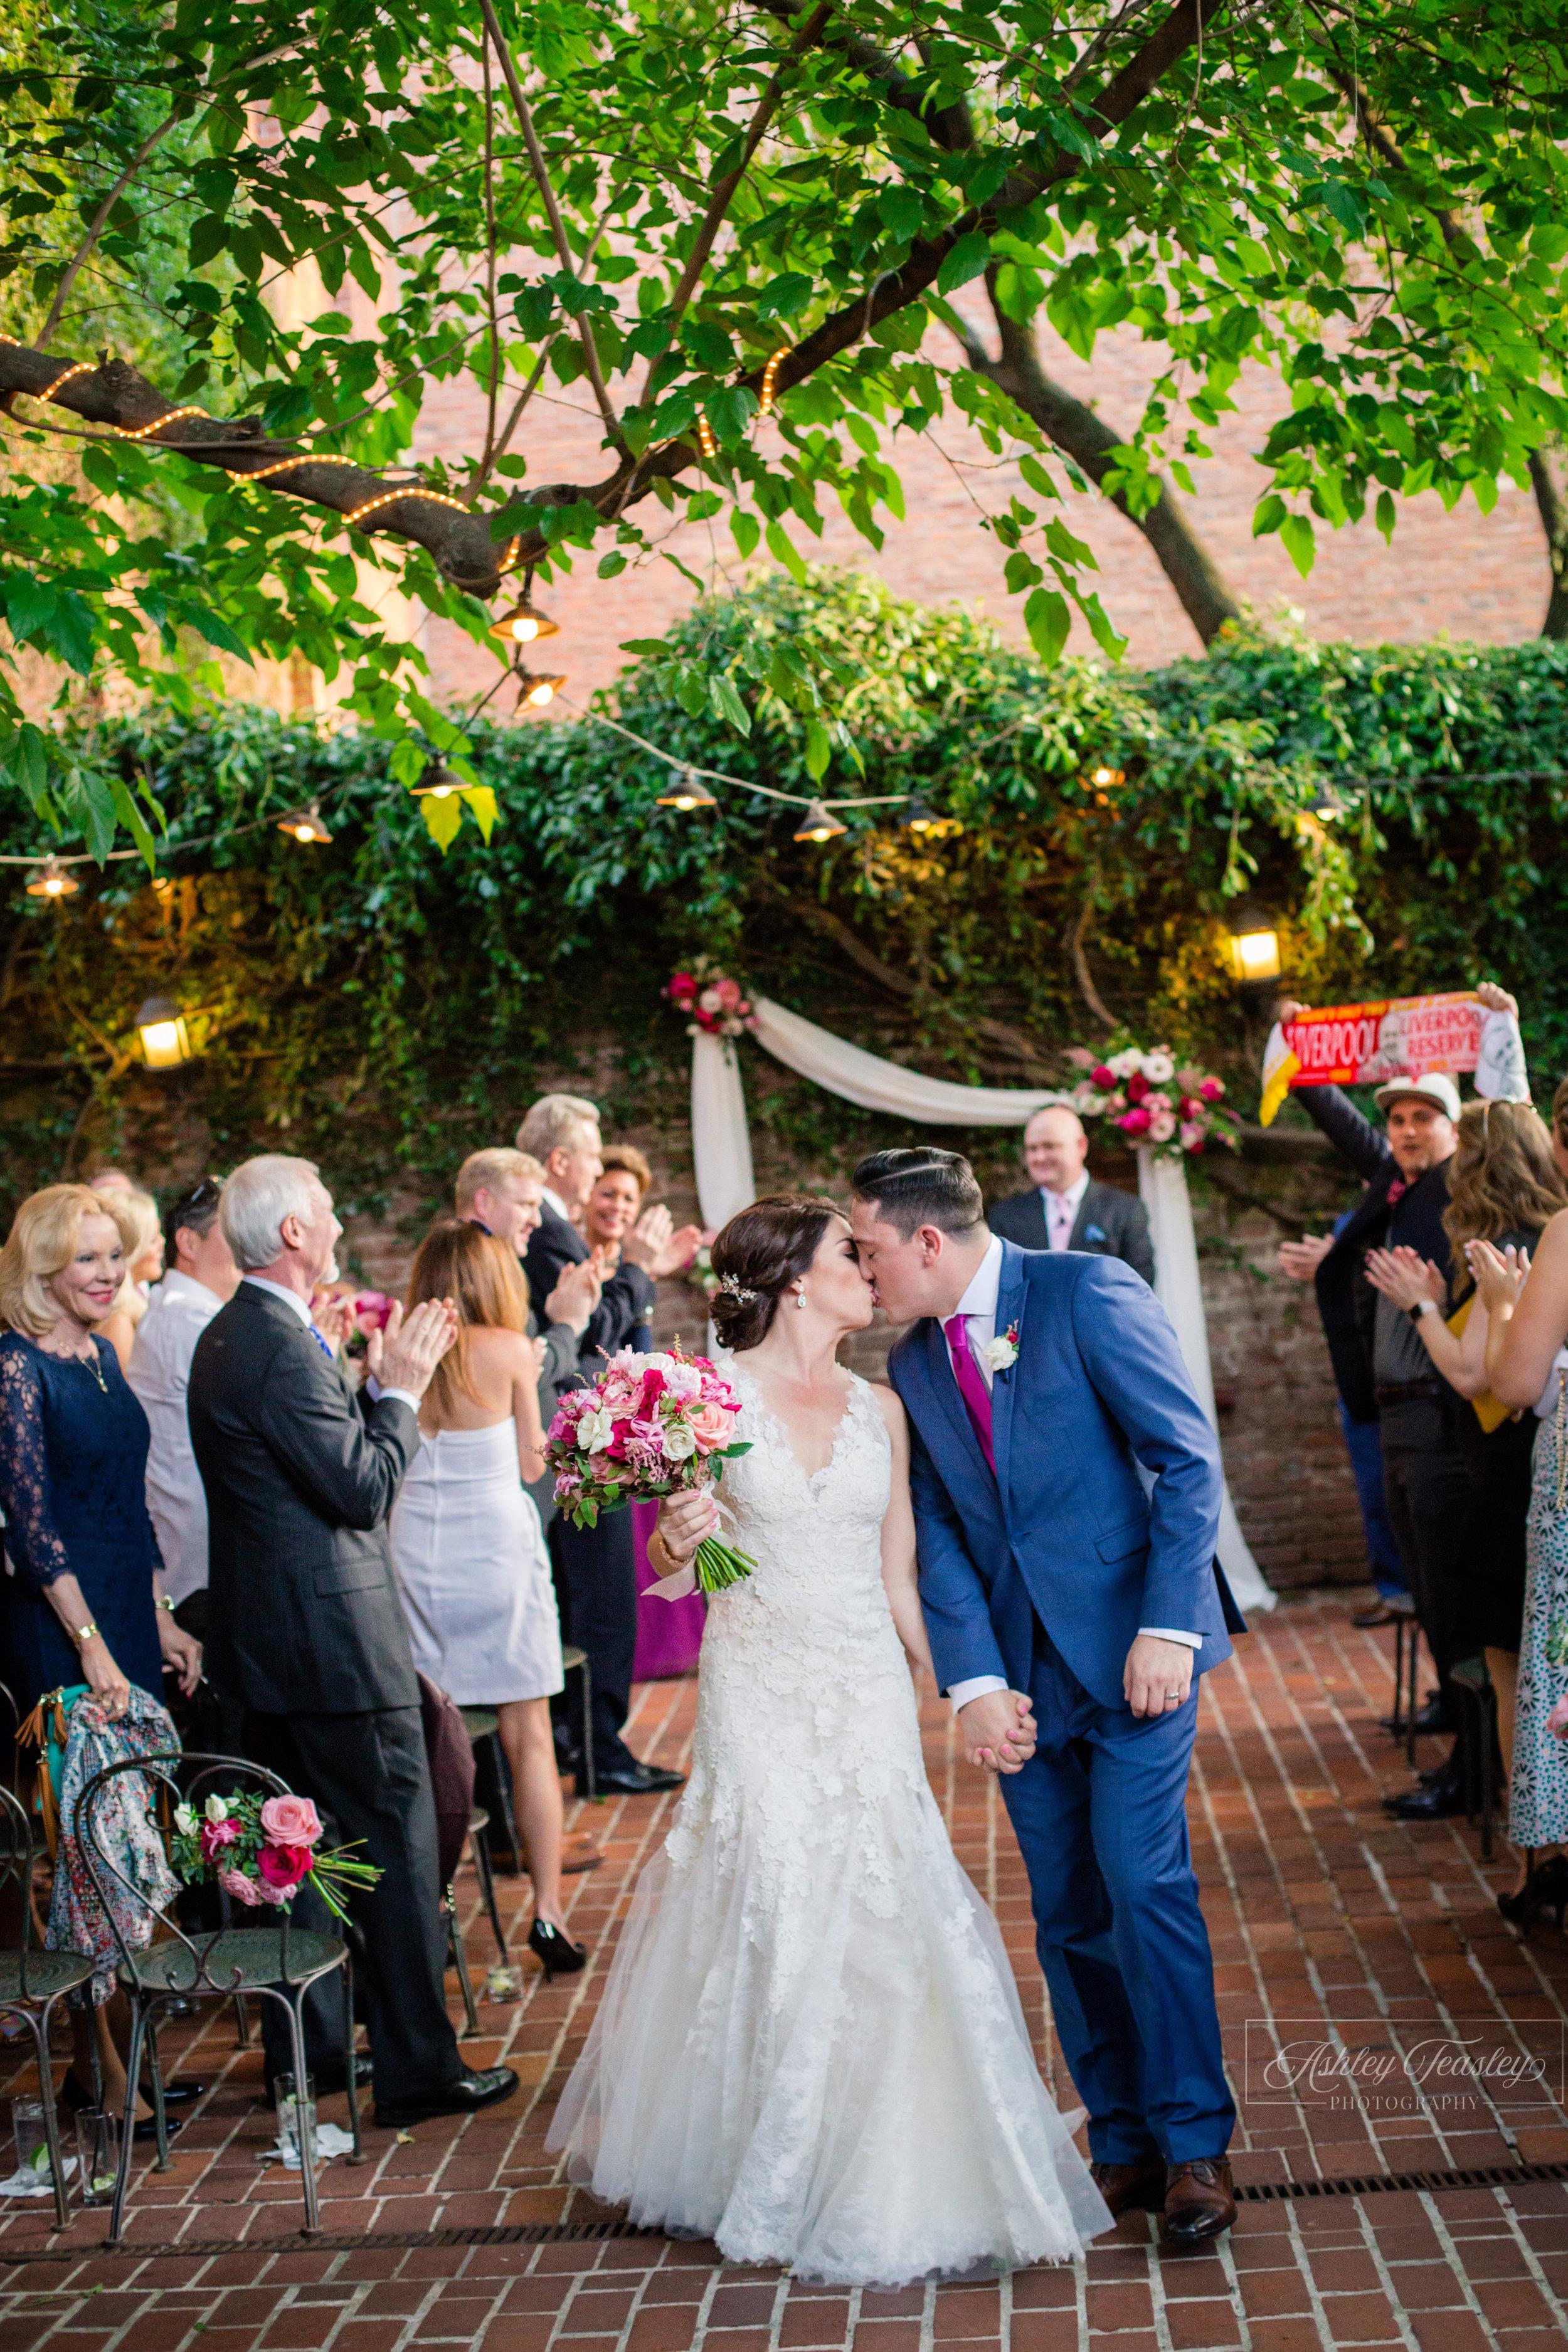 Tarrah & Francisco - The Kimpton Sawyer Hotel - The Firehouse Old Sac - Sacramento Wedding Photographer - Ashley Teasley Photography (395 of 425).jpg